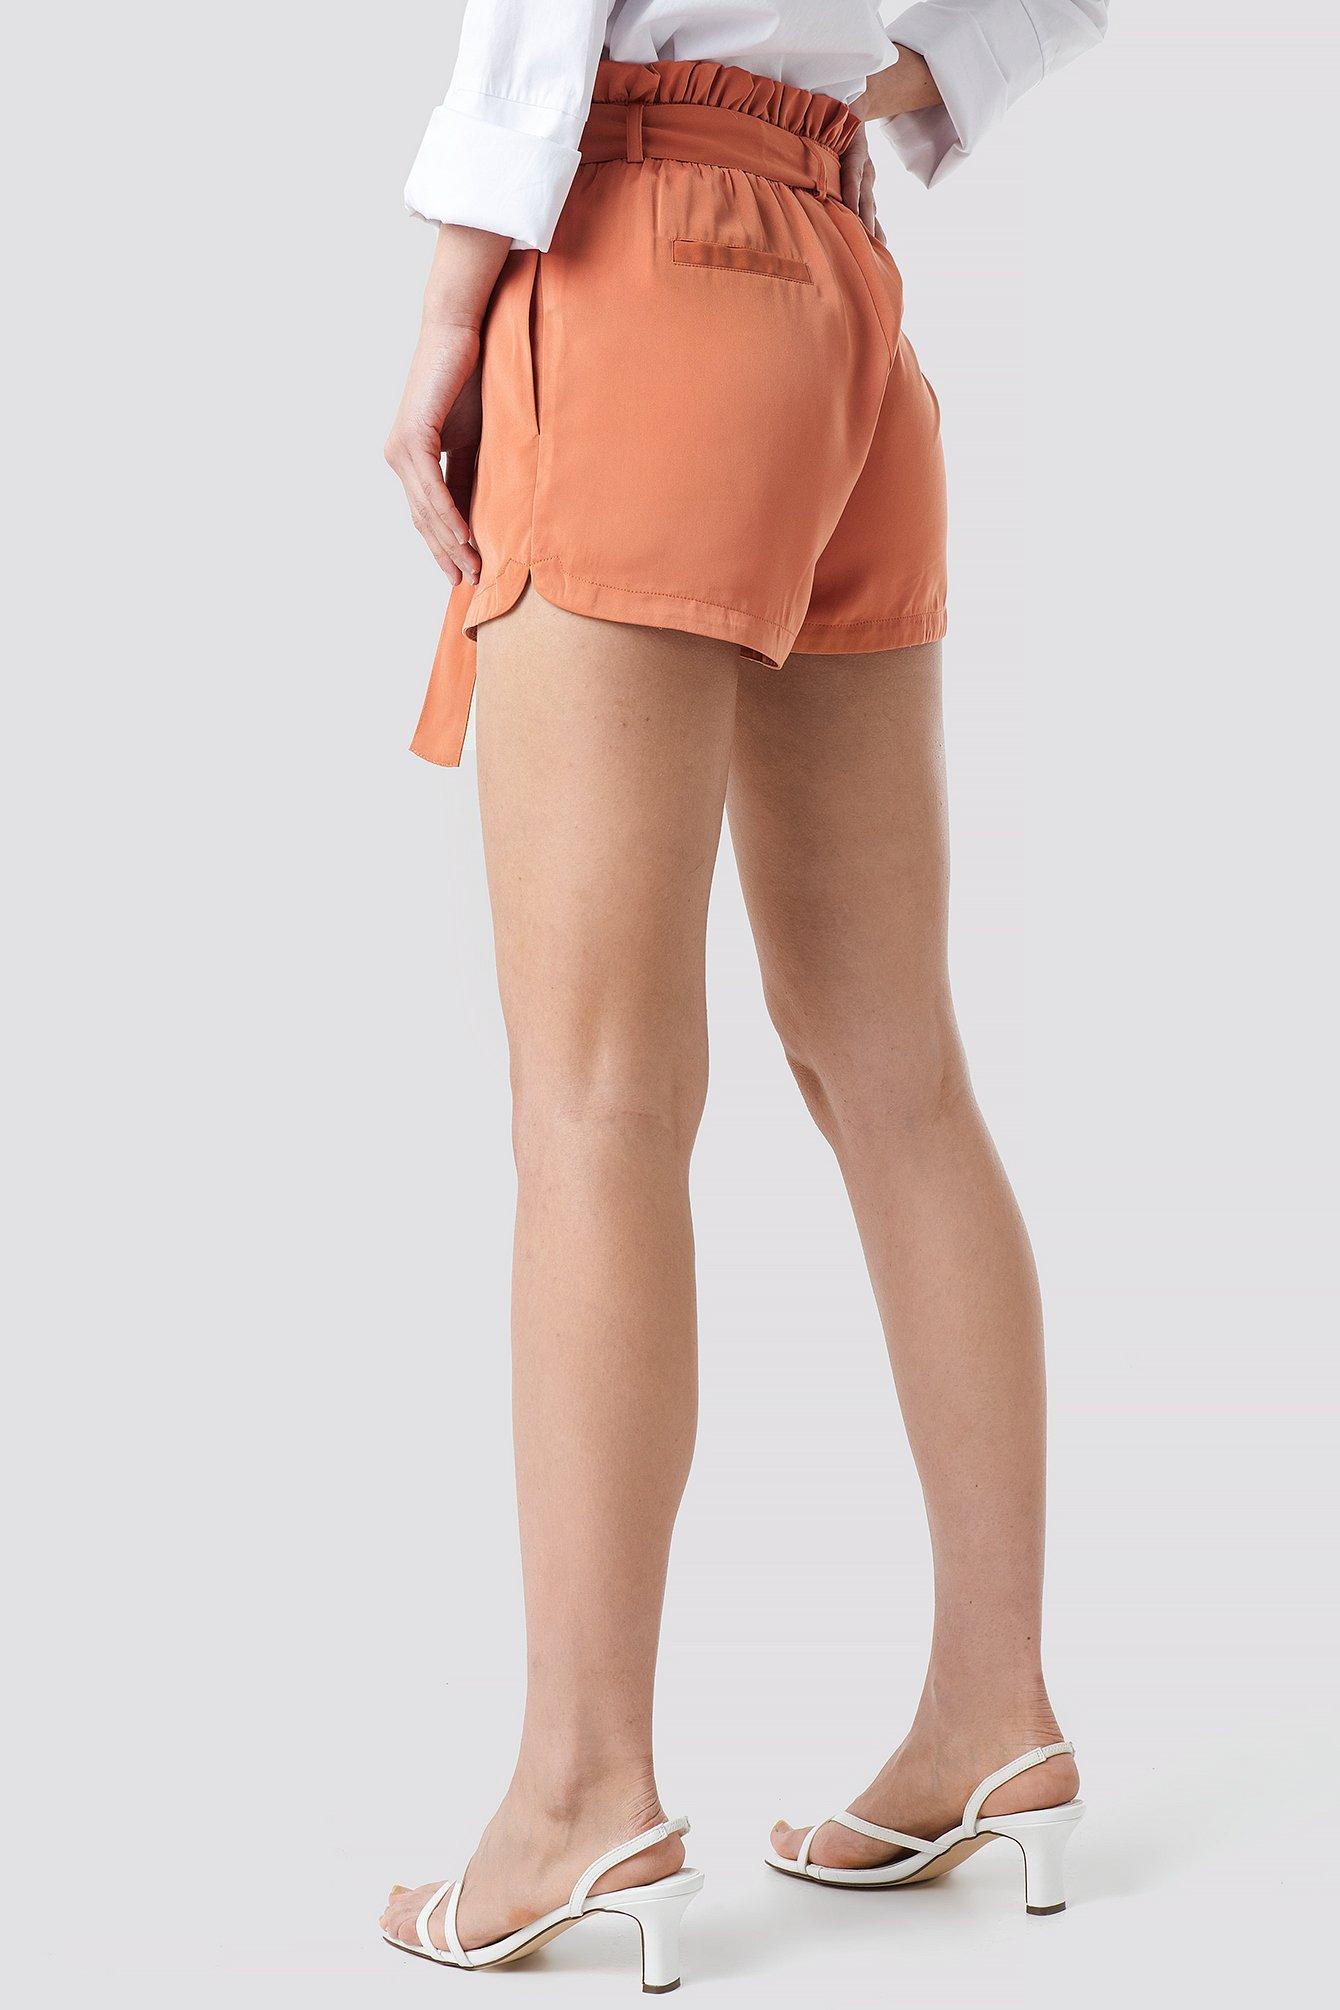 Dora Shorts NA-KD.COM